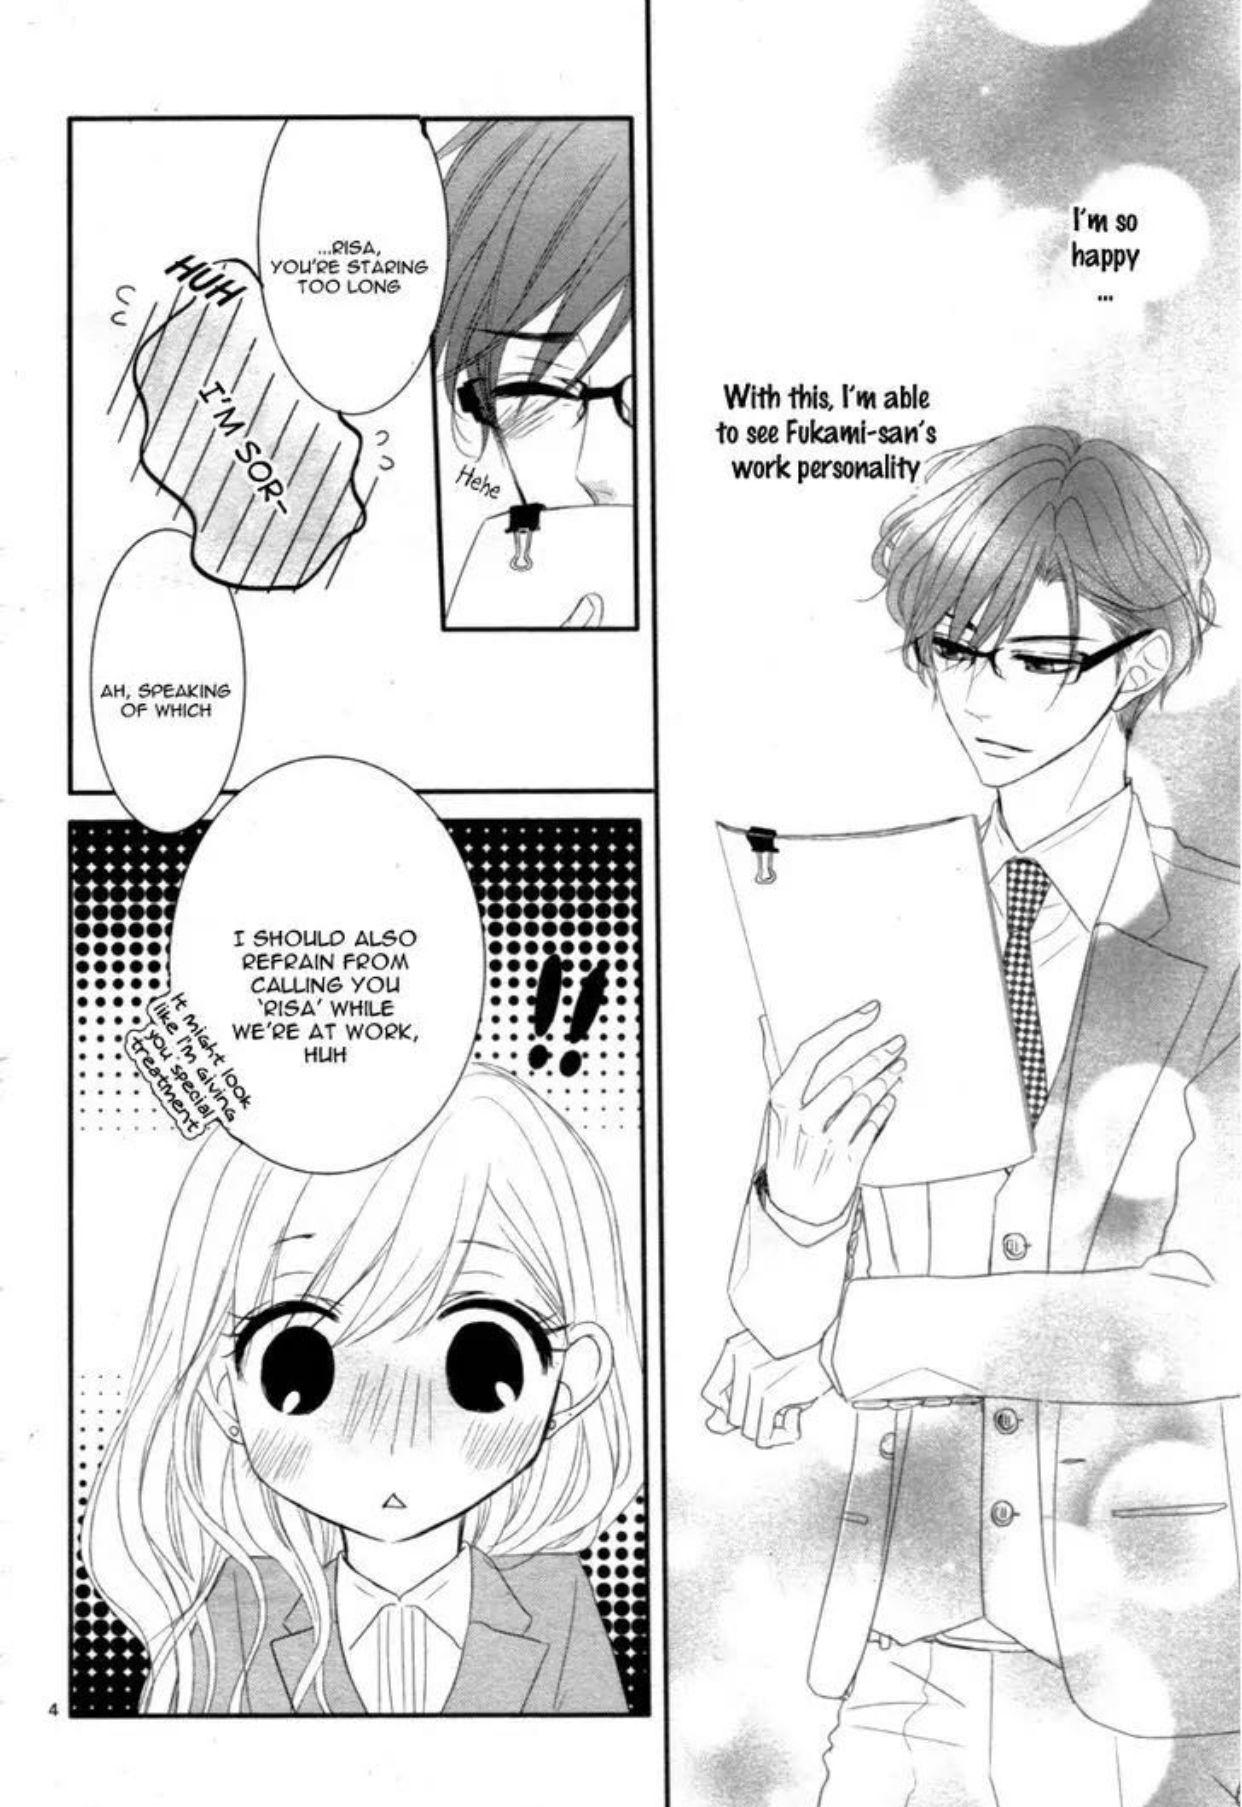 Pin by Animemangaluver on Coffee and Vanilla Manga